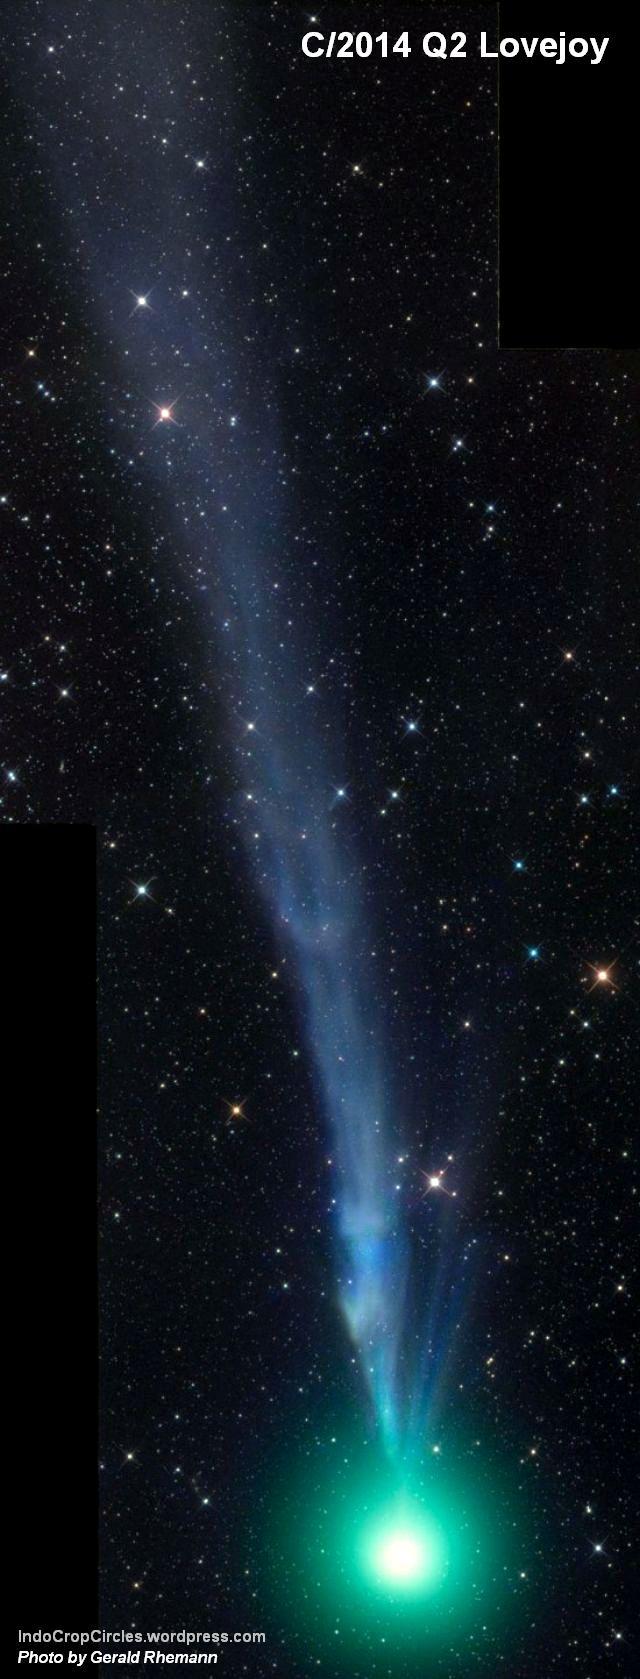 comet-lovejoy-12-23-2014-Gerald-Rhemann-big